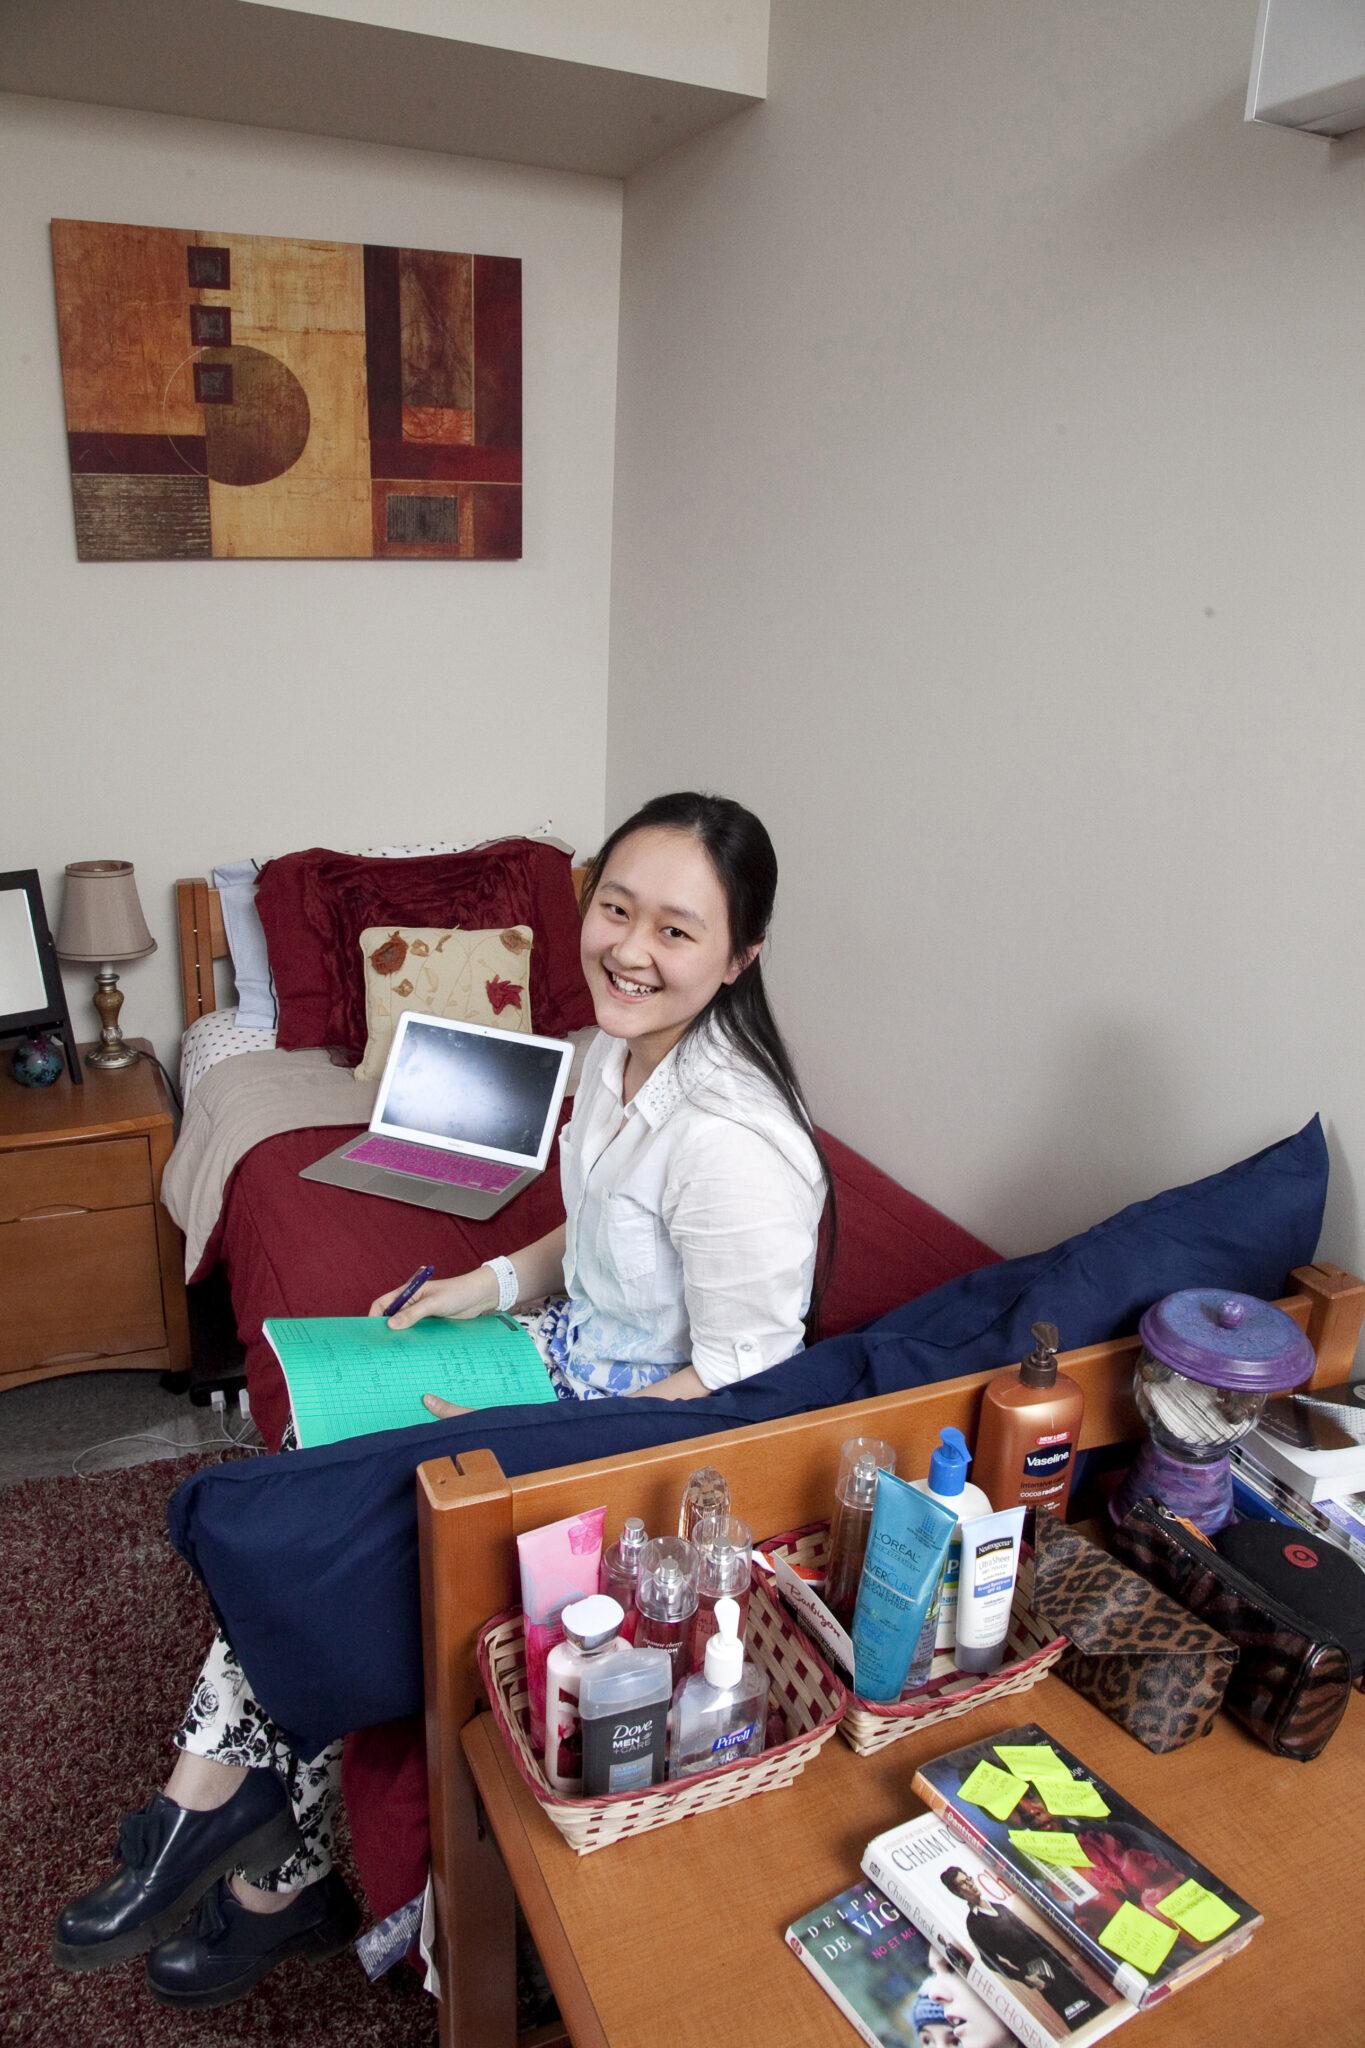 dorm student decorated room